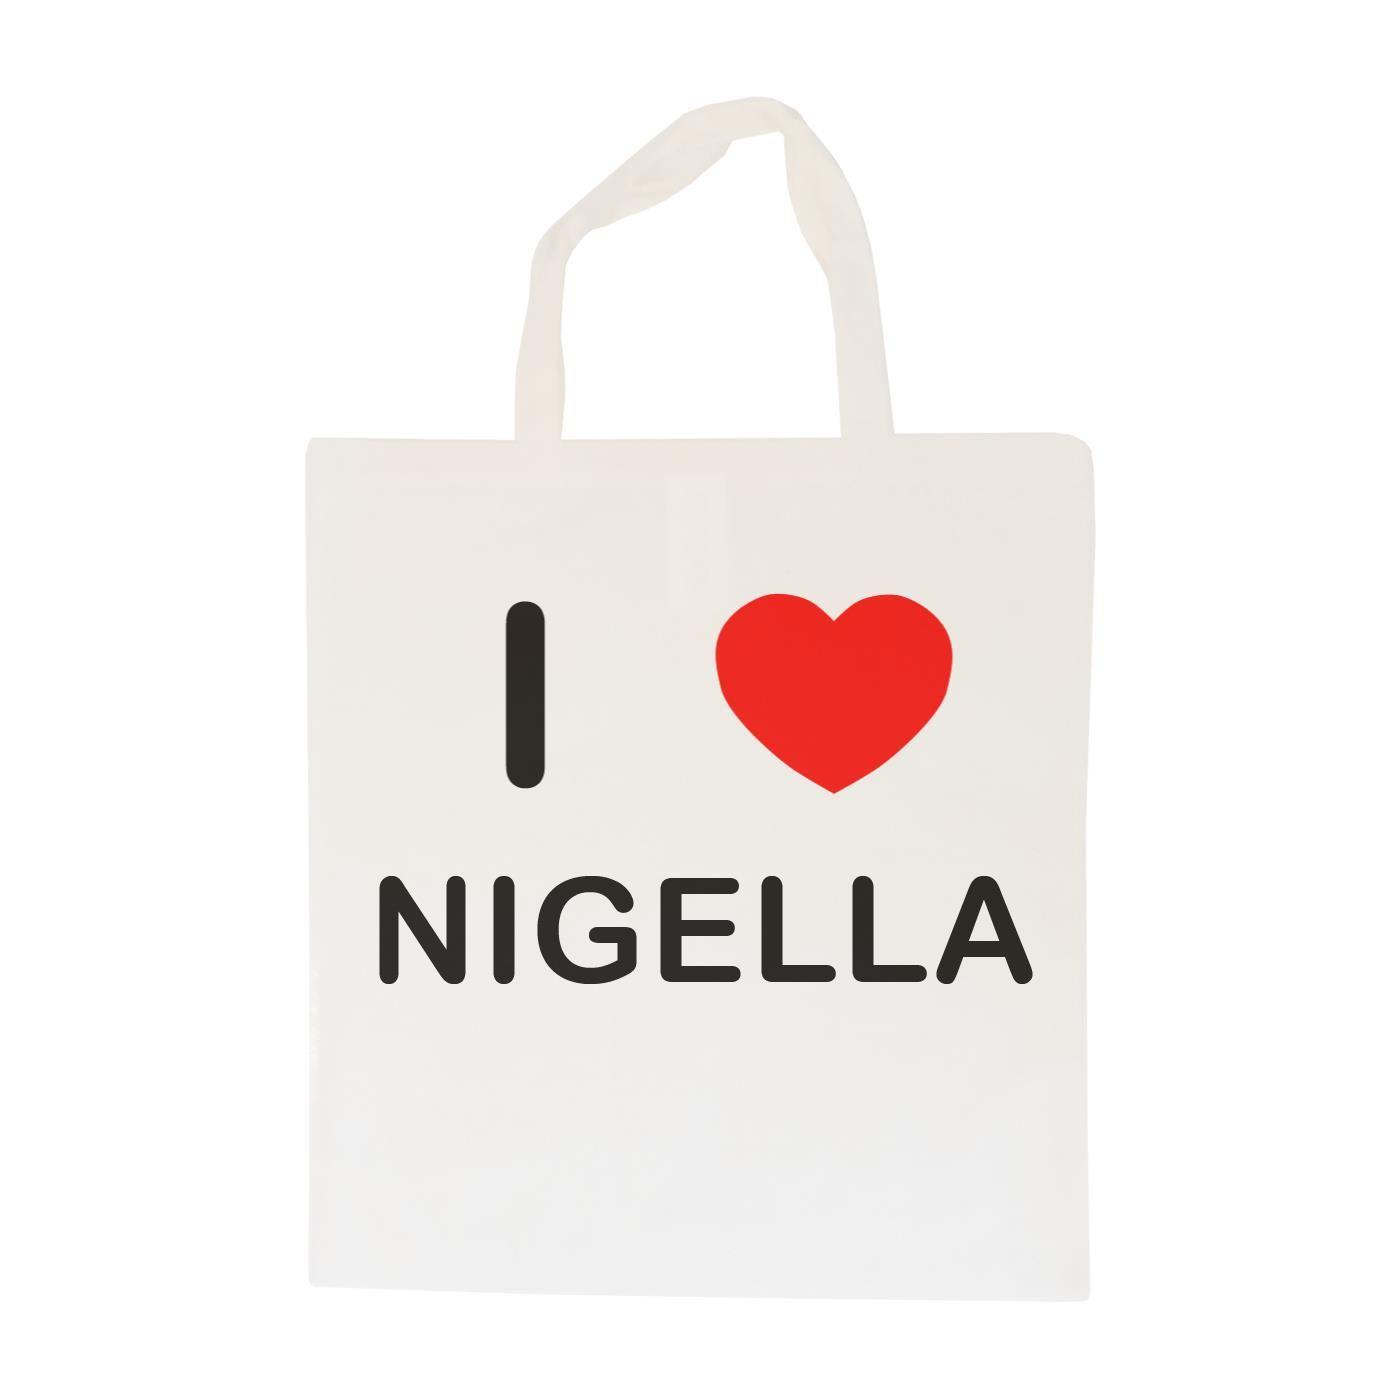 I Love Nigella - Cotton Bag | Size choice Tote, Shopper or Sling